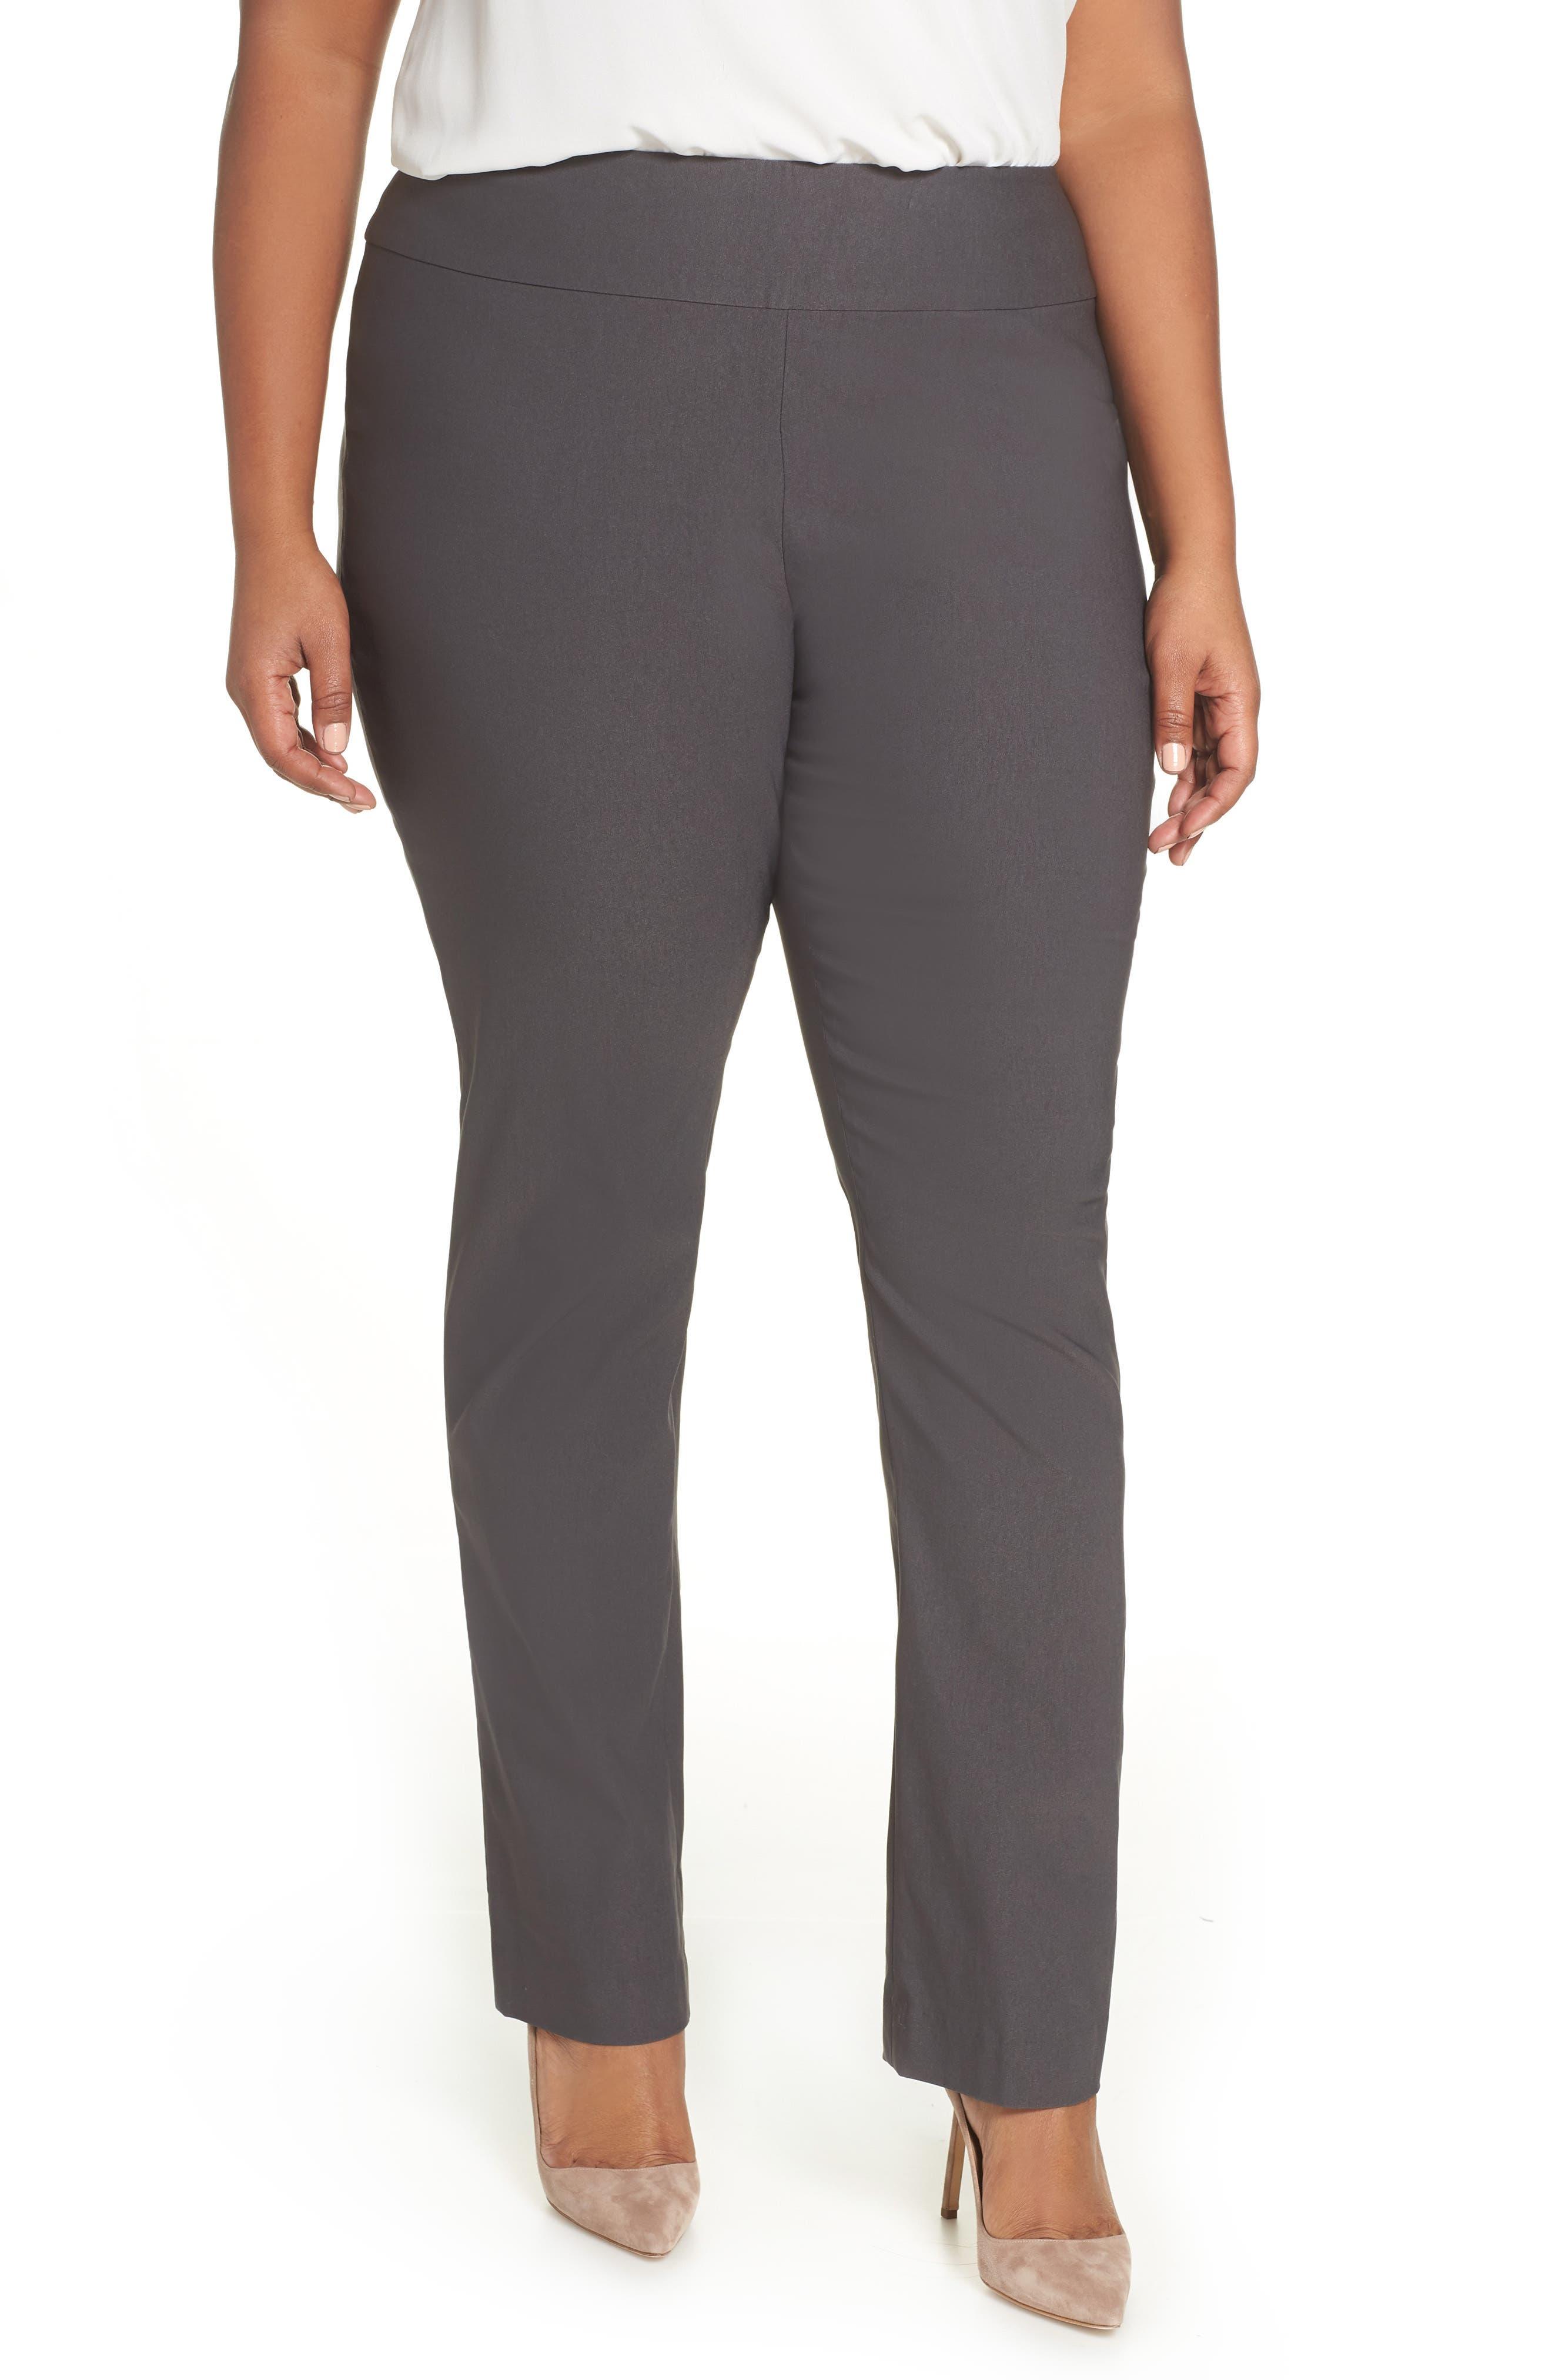 NIC+ZOE, Wonderstretch High Rise Slim Leg Pants, Main thumbnail 1, color, GRAPHITE